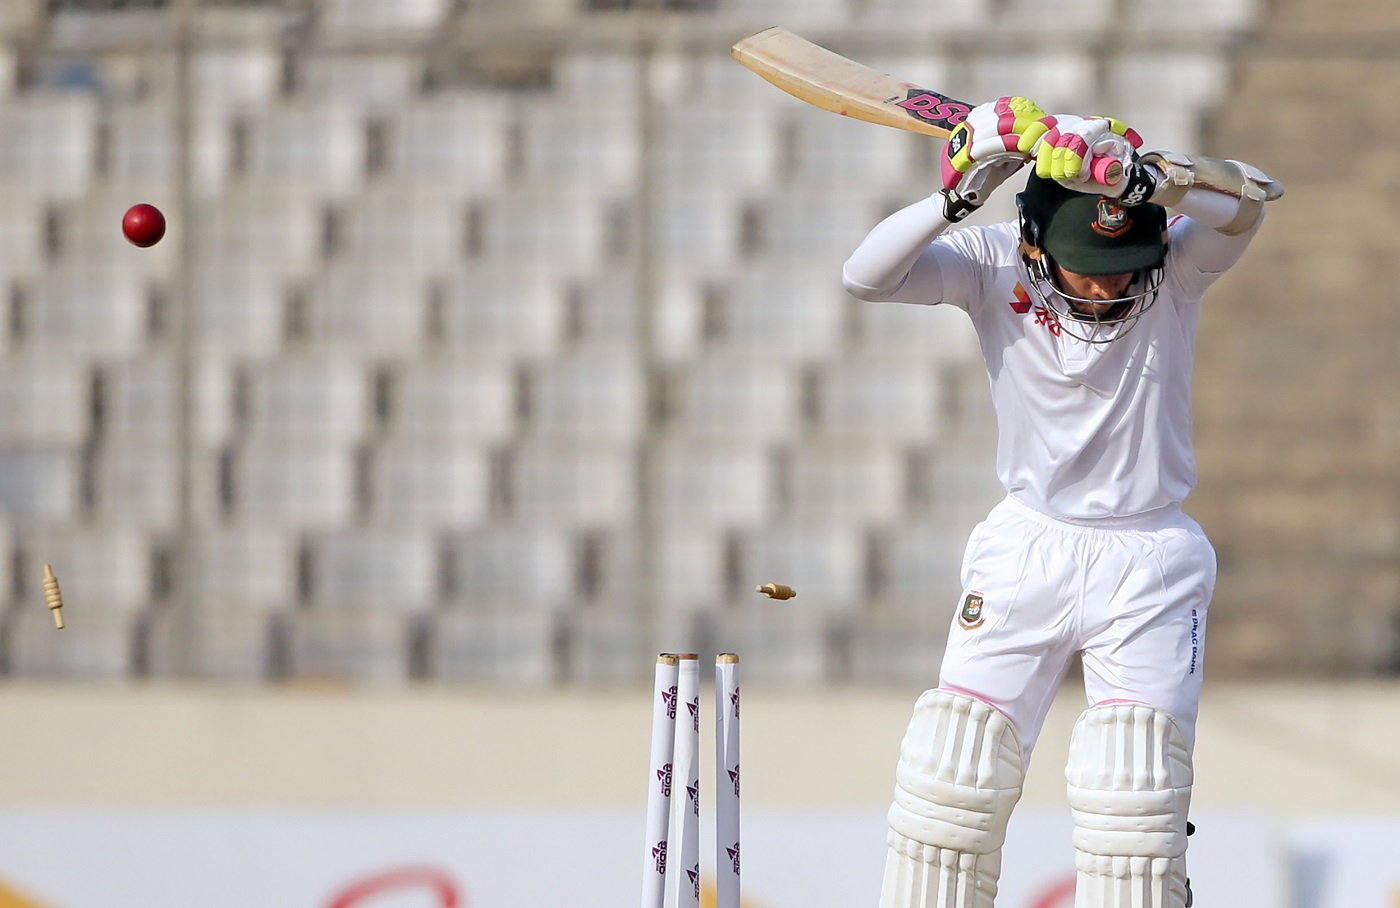 Bangladeshi cricketer Mushfiqur Rahim reacts after being dismissed